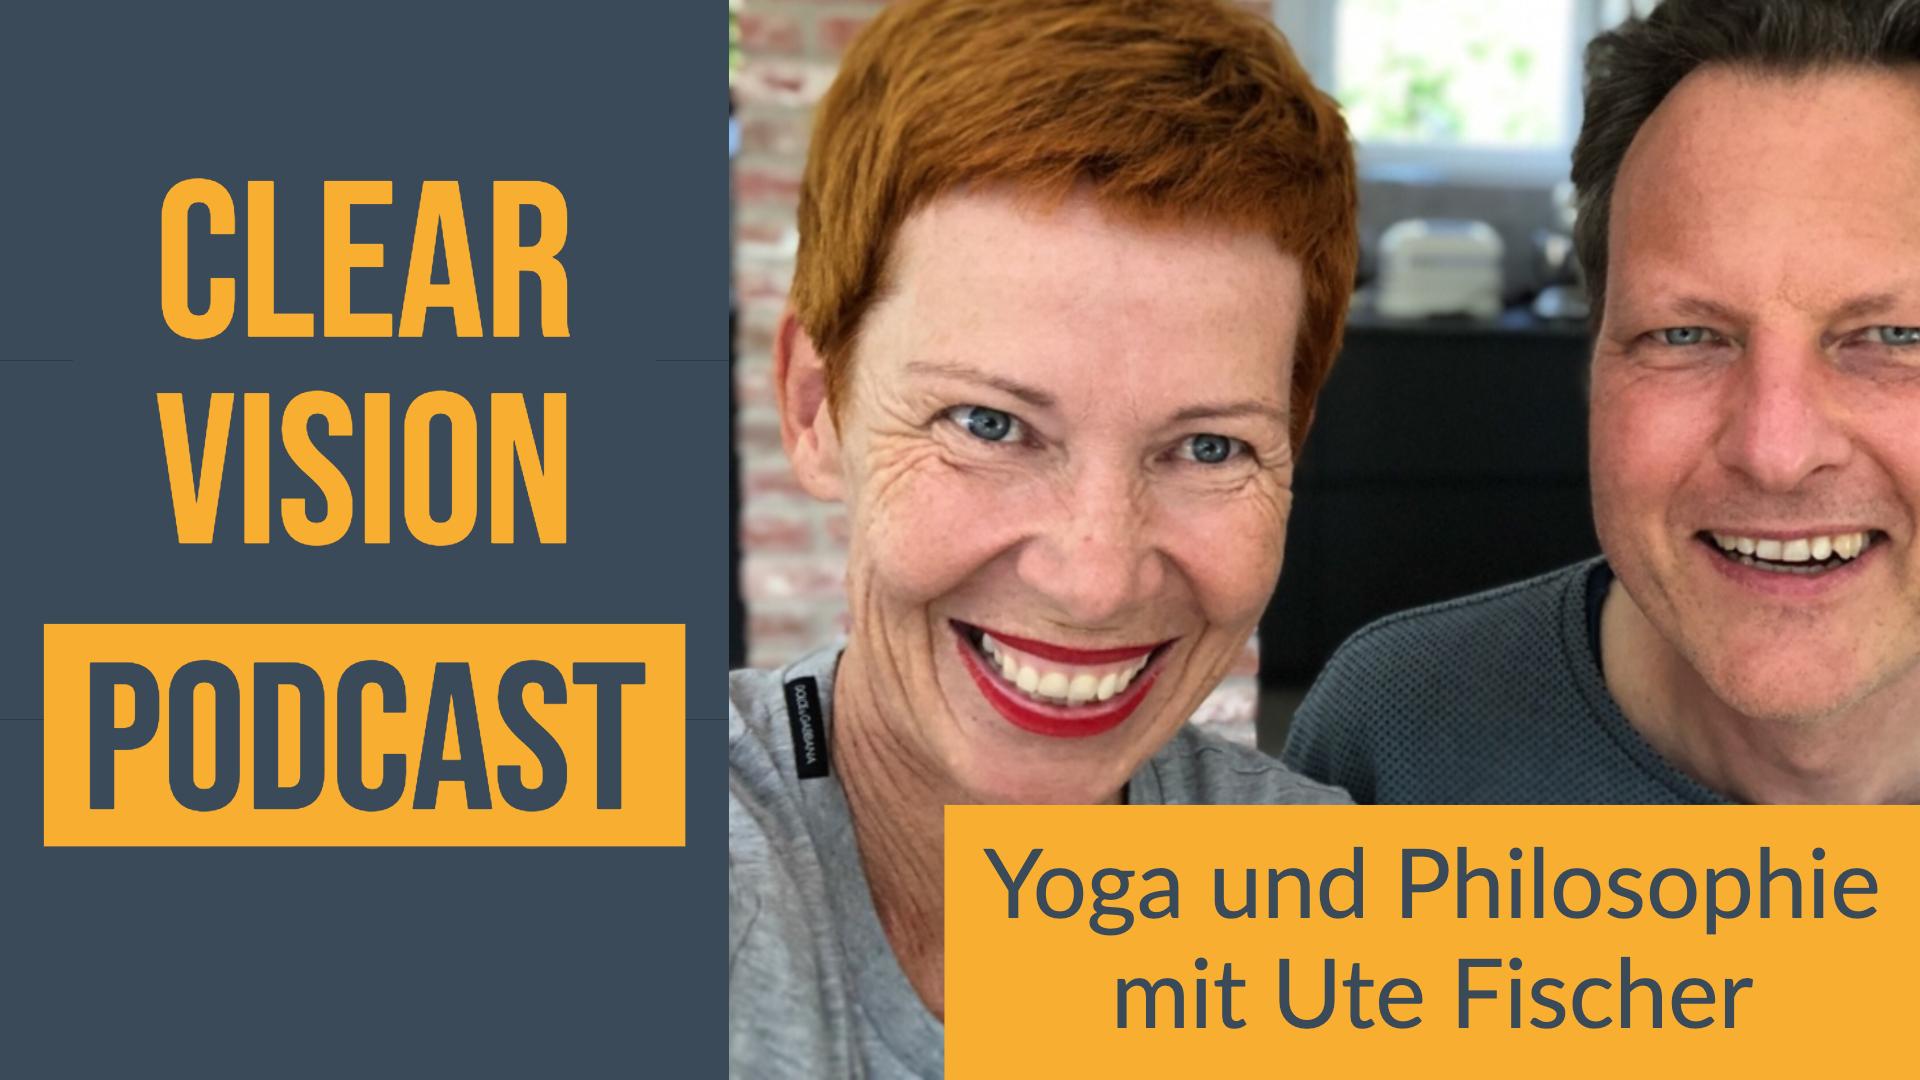 Titel Clearvision Podcast Interview mit Ute Fischer